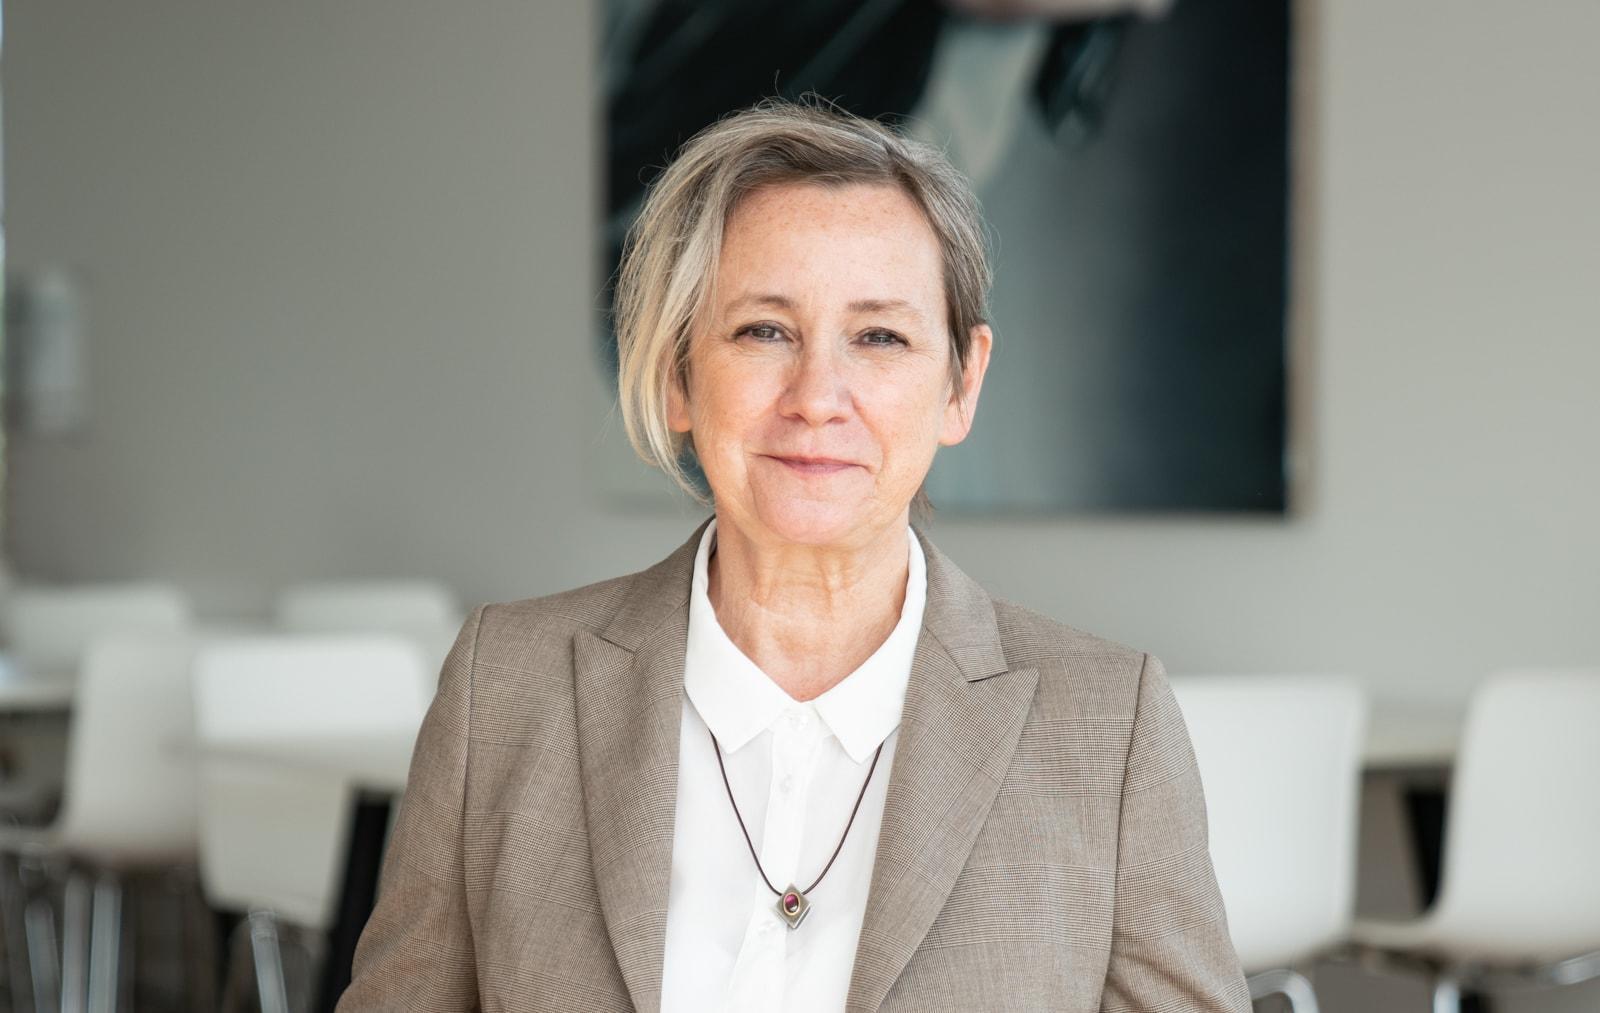 Rechtsanwältin Georgine Meyer